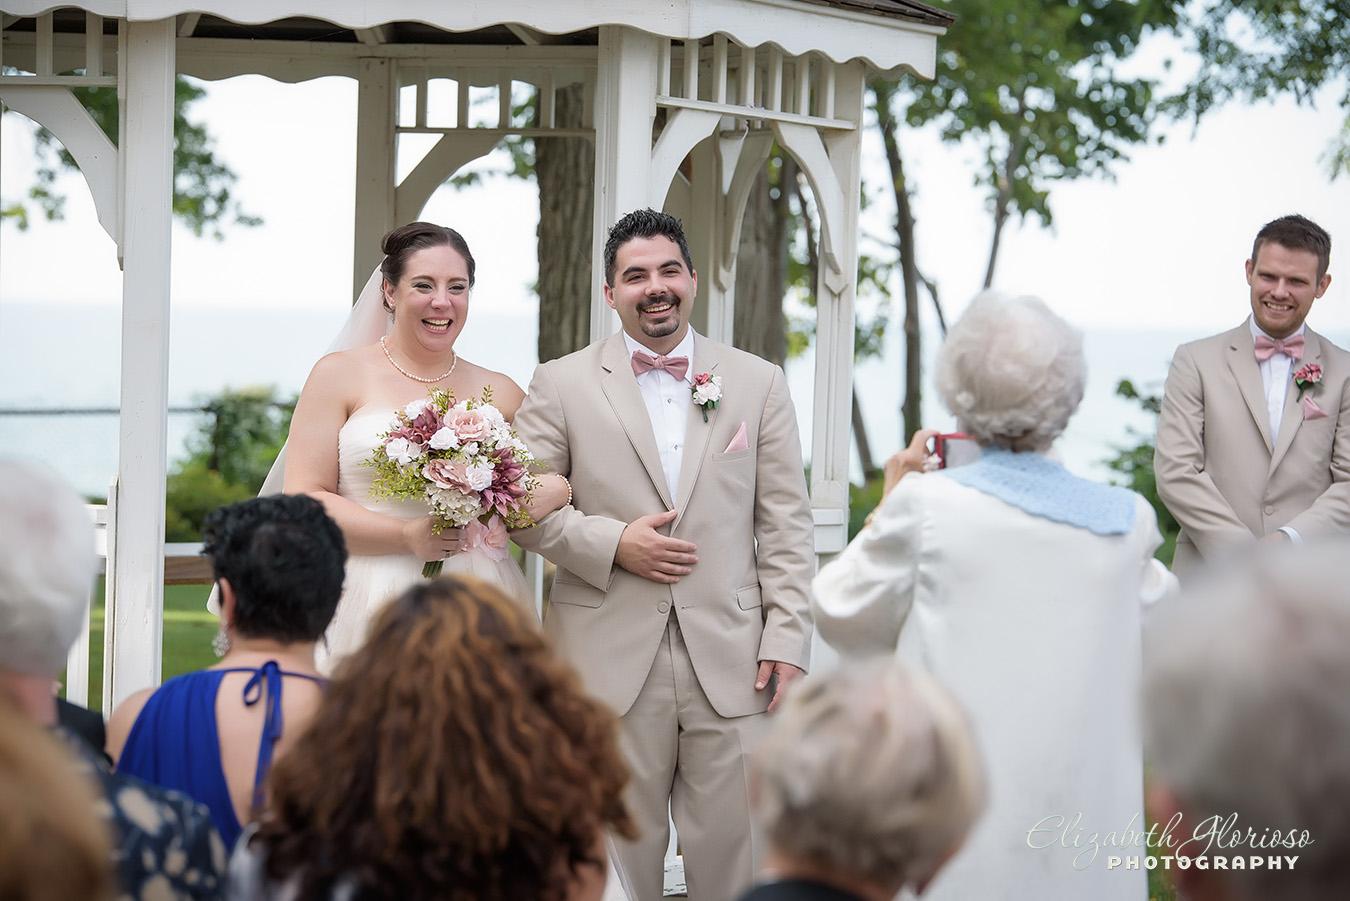 Vermilion_wedding_Glorioso Photography_1033